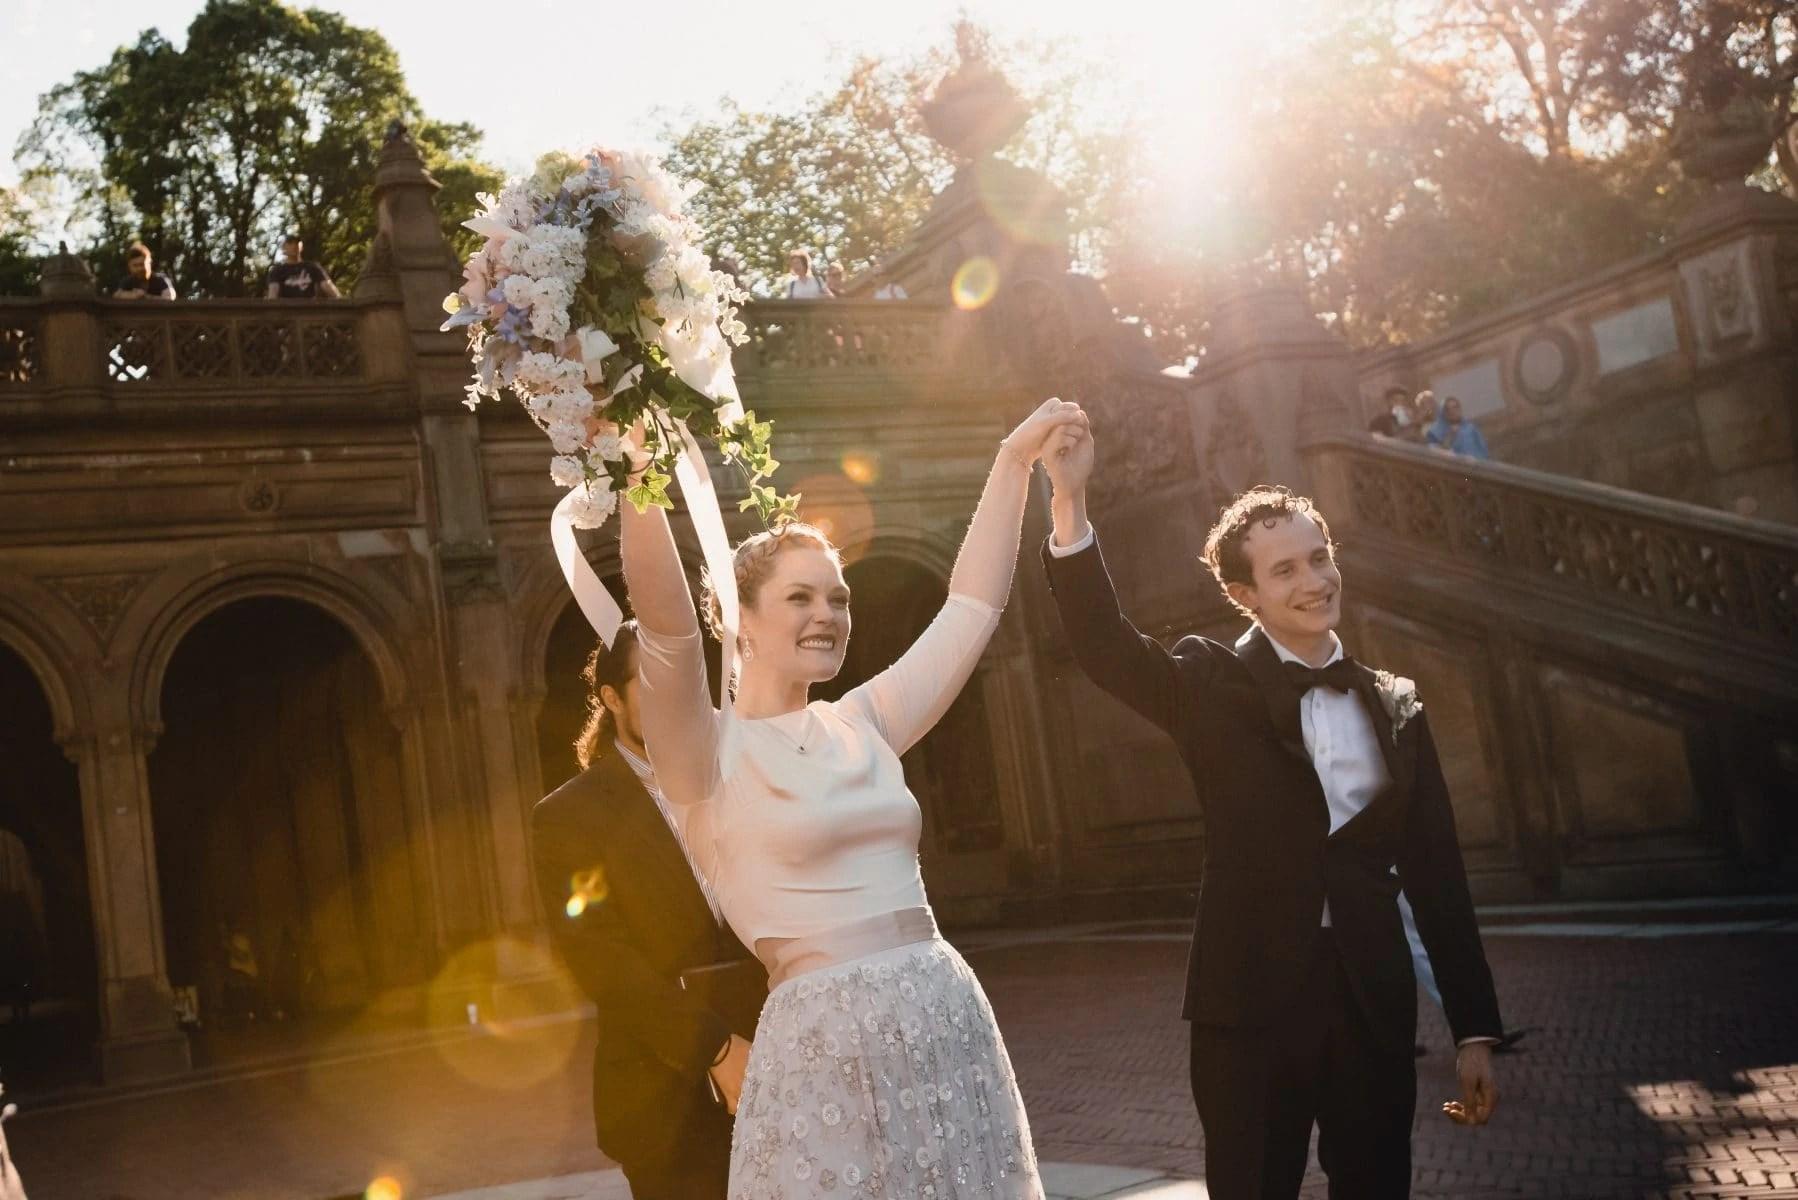 Central Park Elopement Wedding photos